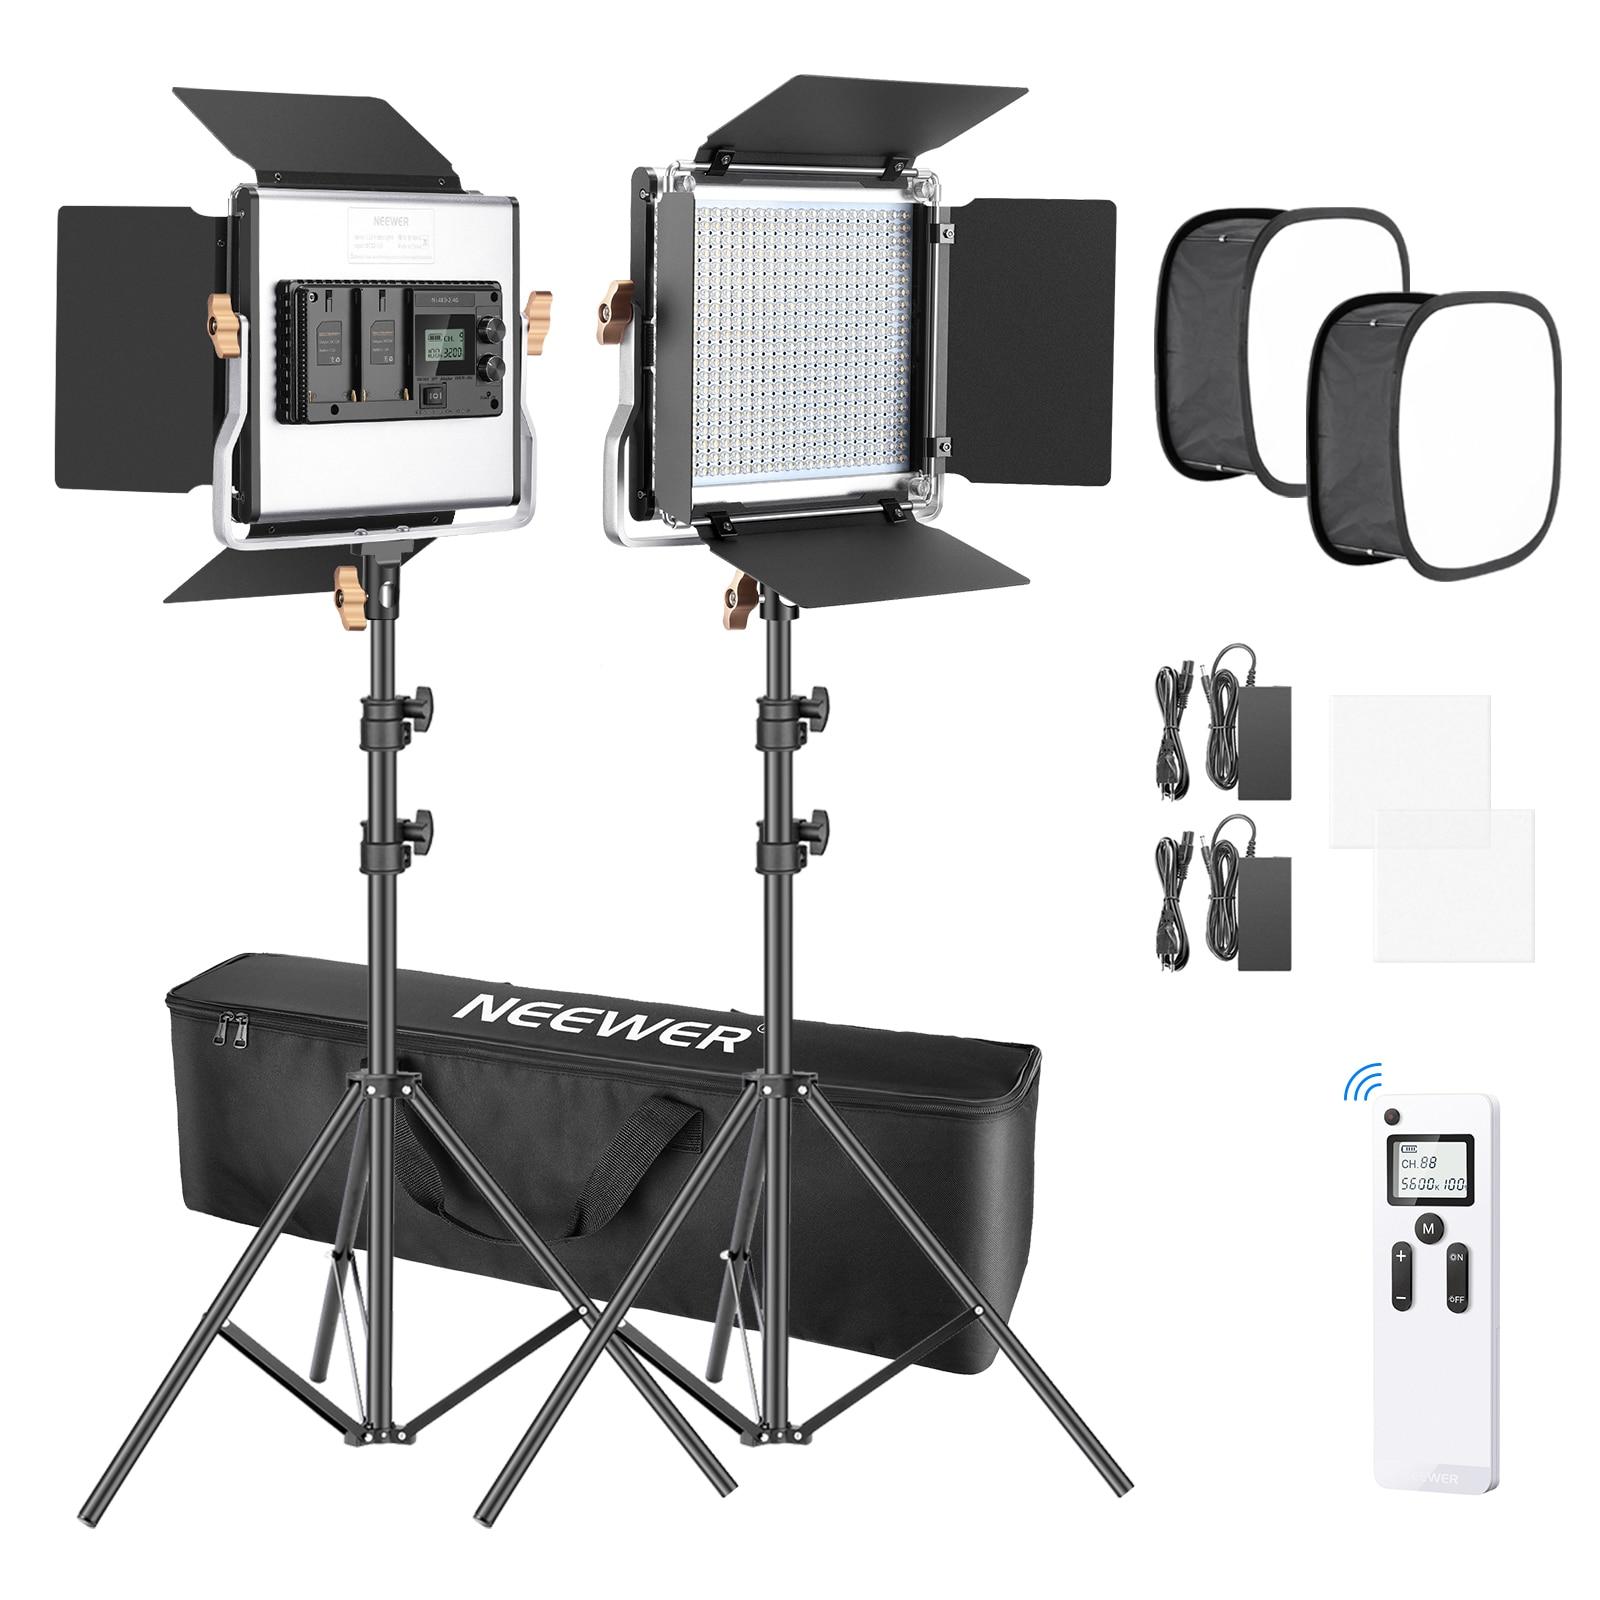 Neewer 2 حزم 480 LED الفيديو ضوء التصوير الإضاءة كيت ، LED لوحة مع 2.4G اللاسلكية عن بعد ، 660 LED لوحة و ضوء موقف